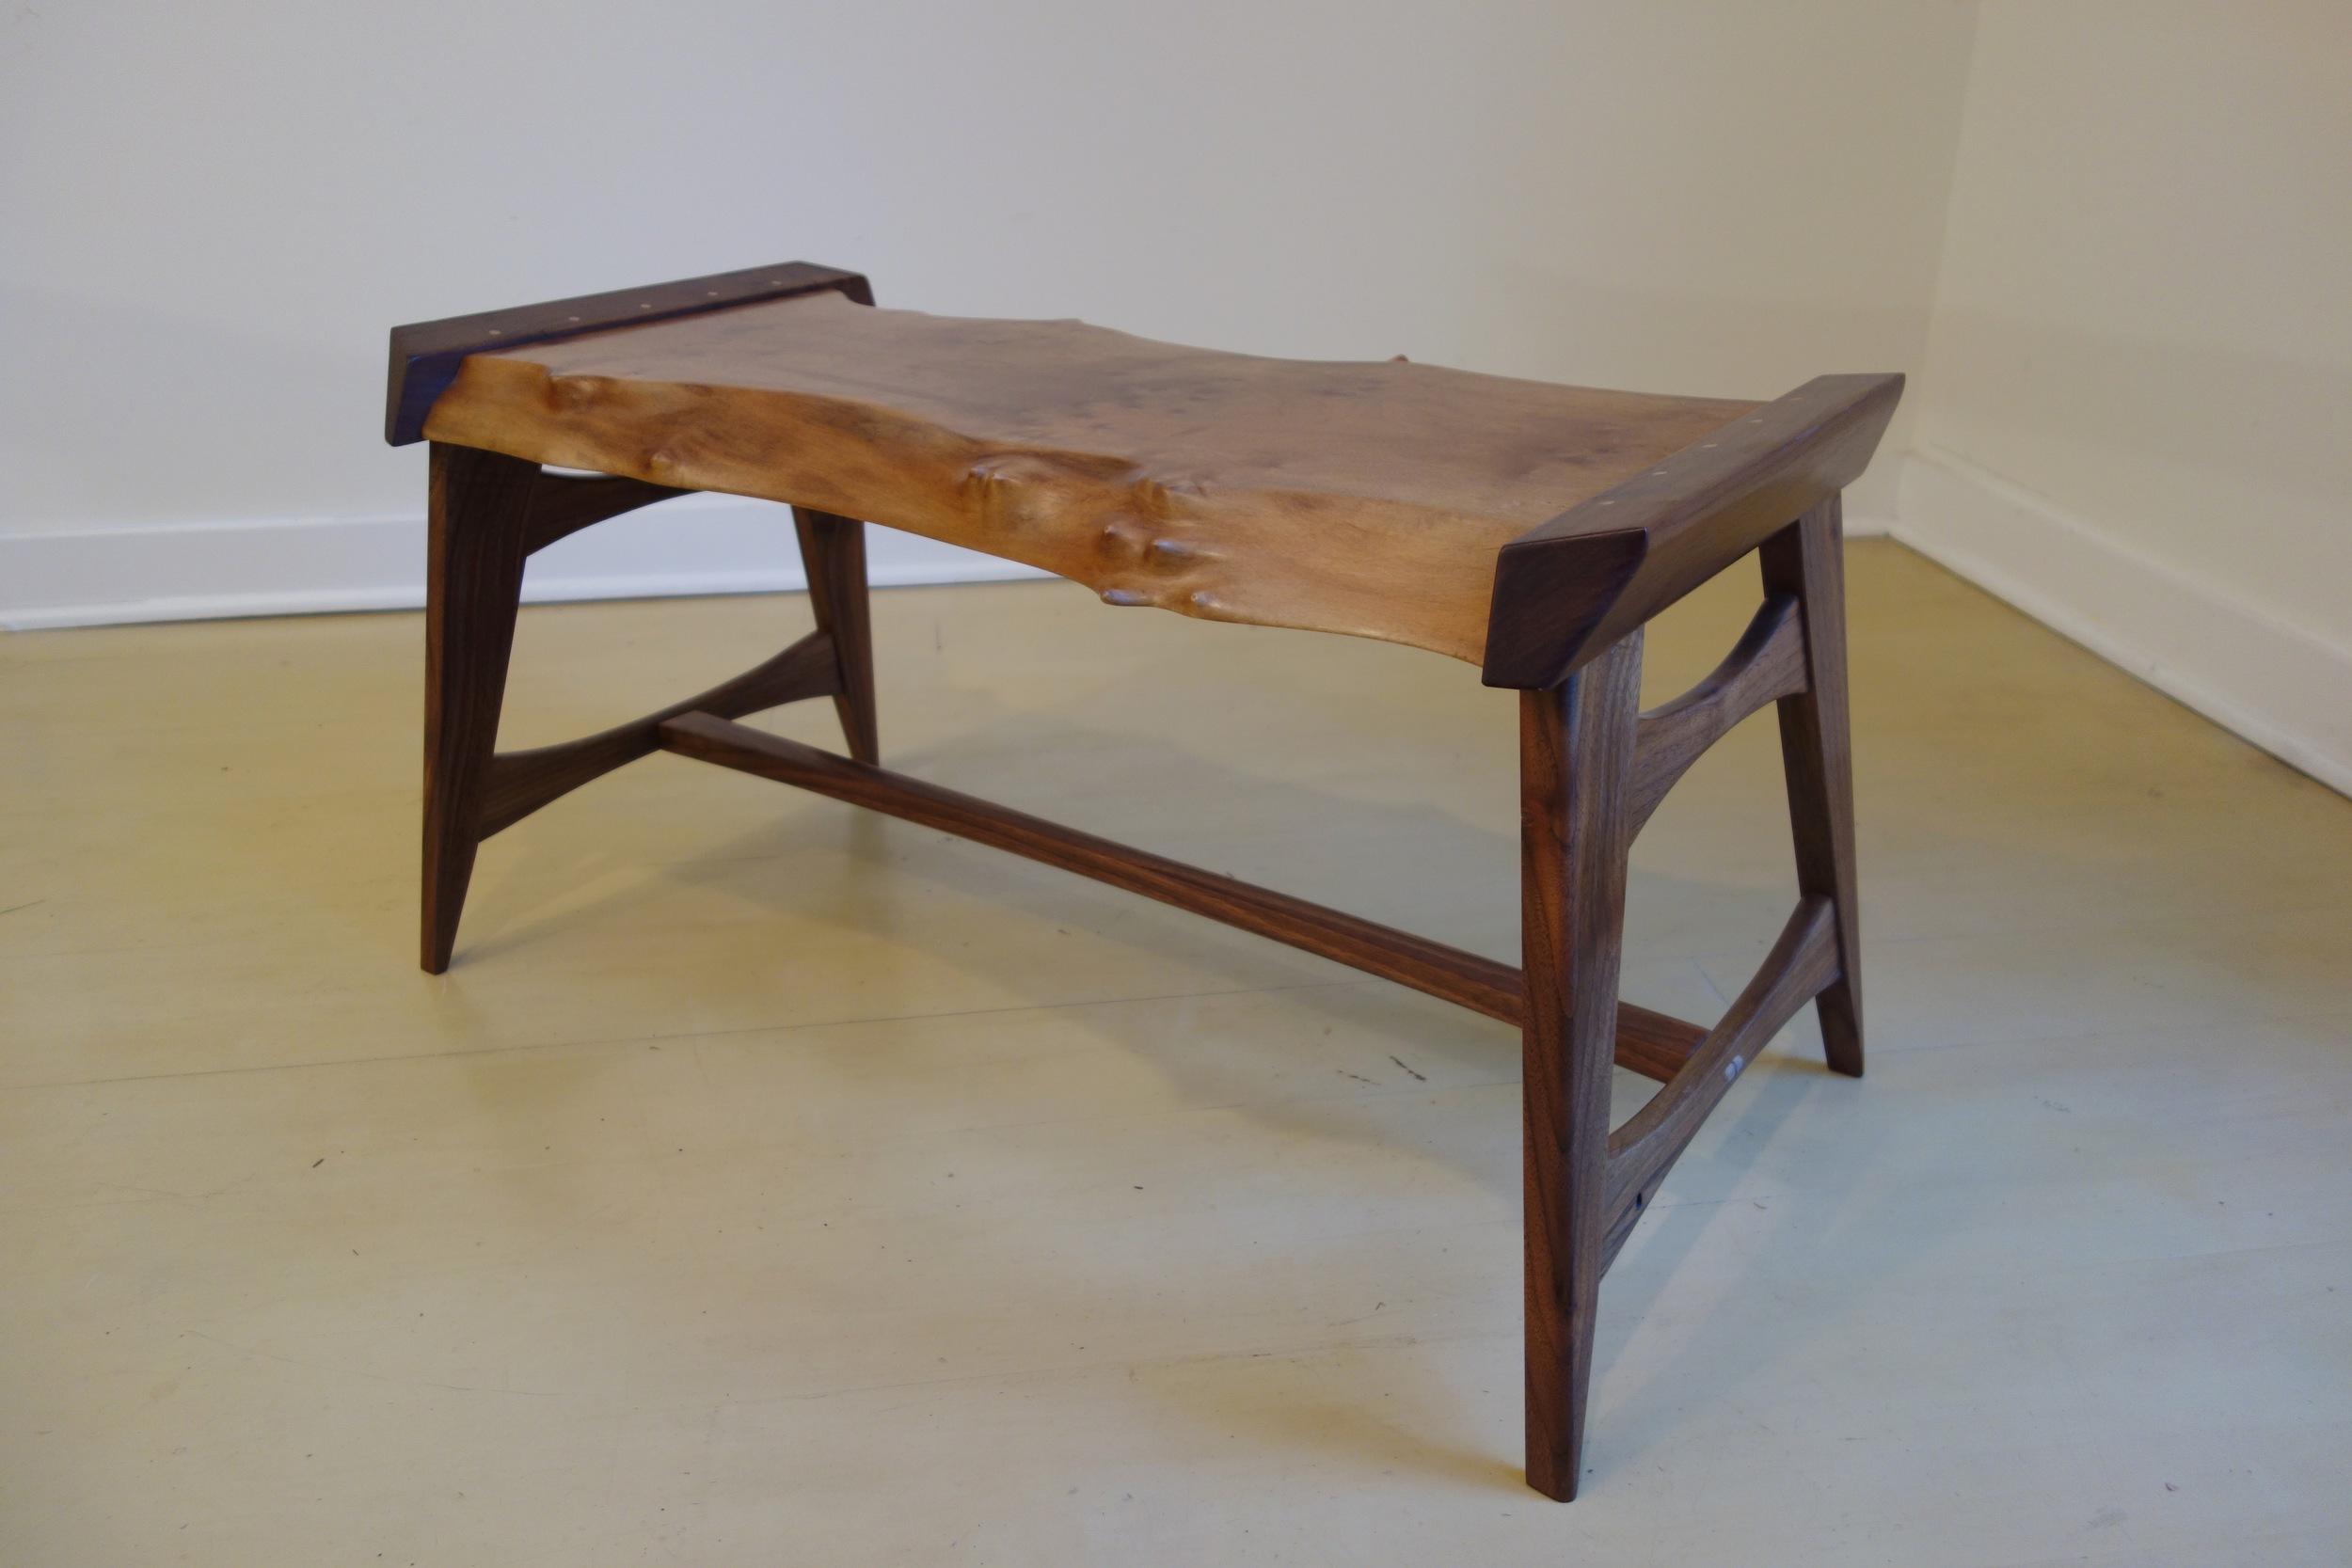 Johnny_A_Williams_Rex_Coffee_Table_1.jpg